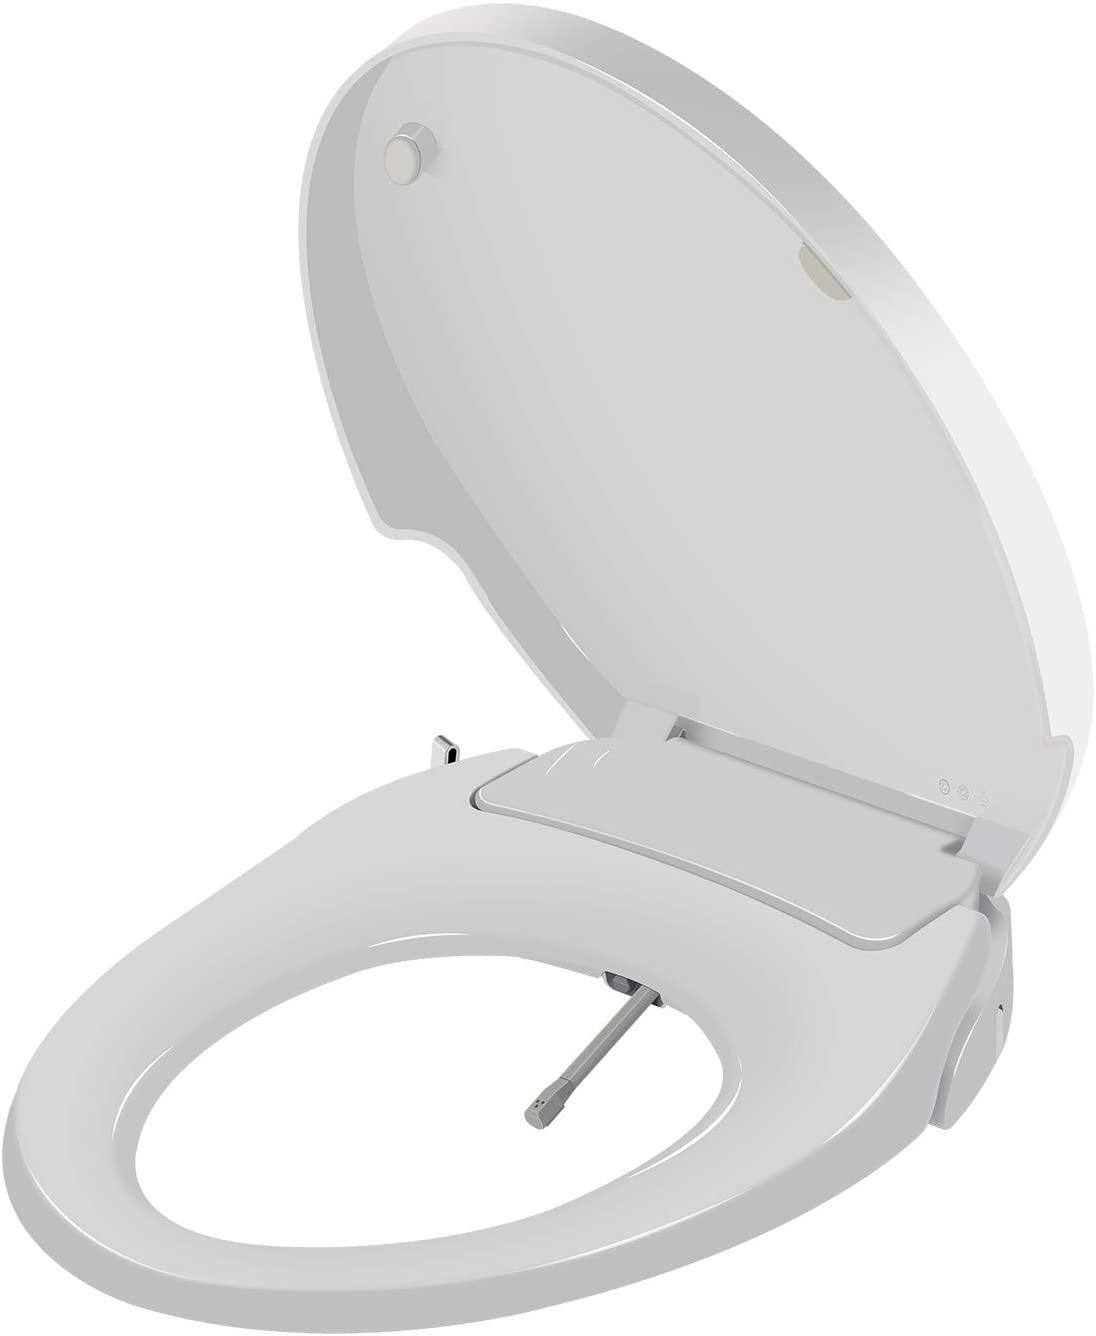 Saniwise Elongated Advanced Bidet Toilet Seat